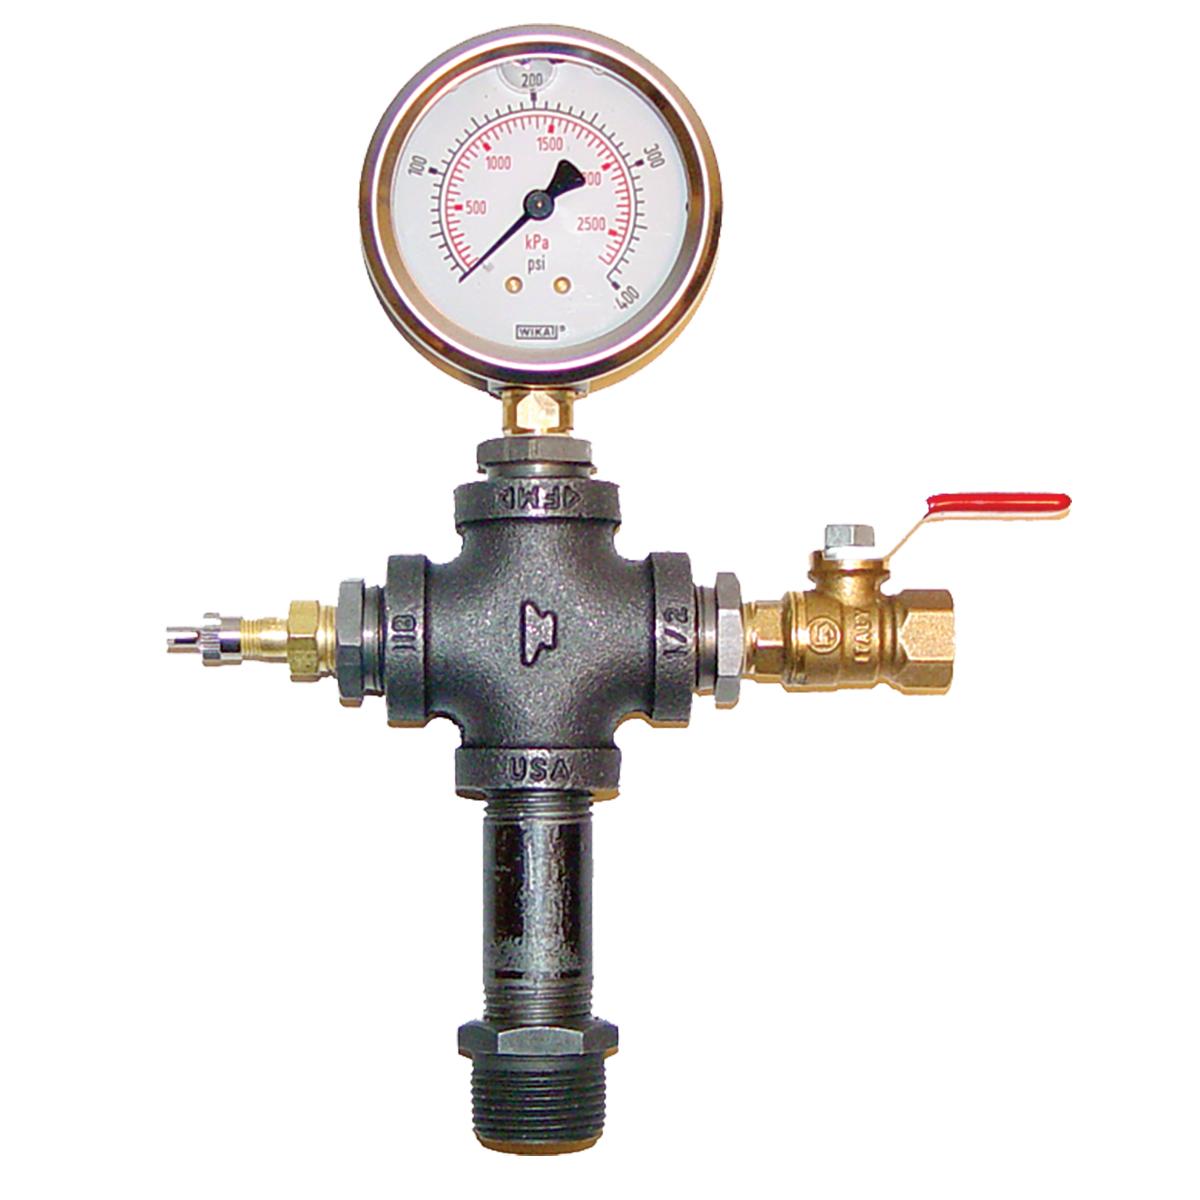 TEST GAUGE - Pressure test gauge